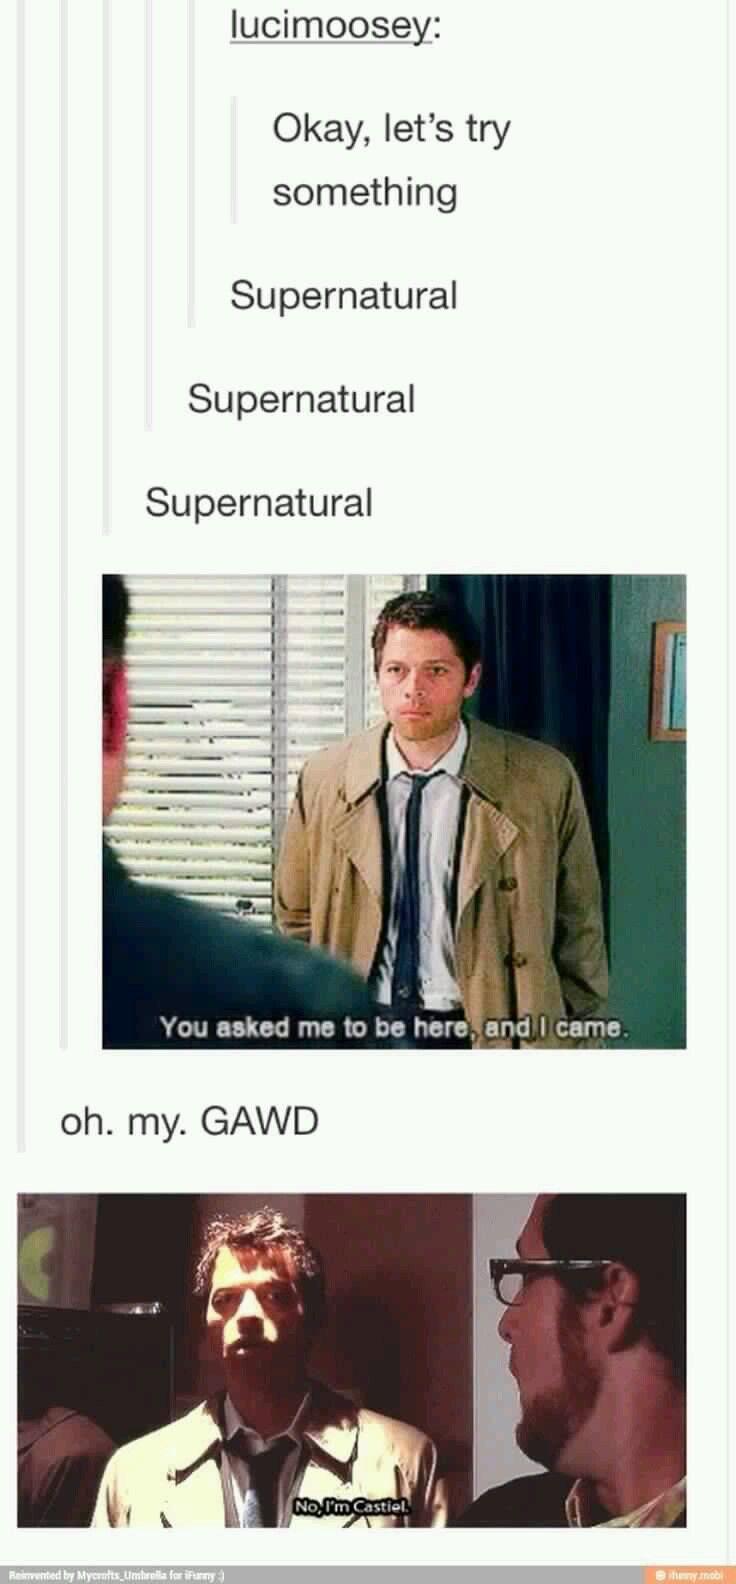 Supernatural... Supernatural... SUPERNATURAL